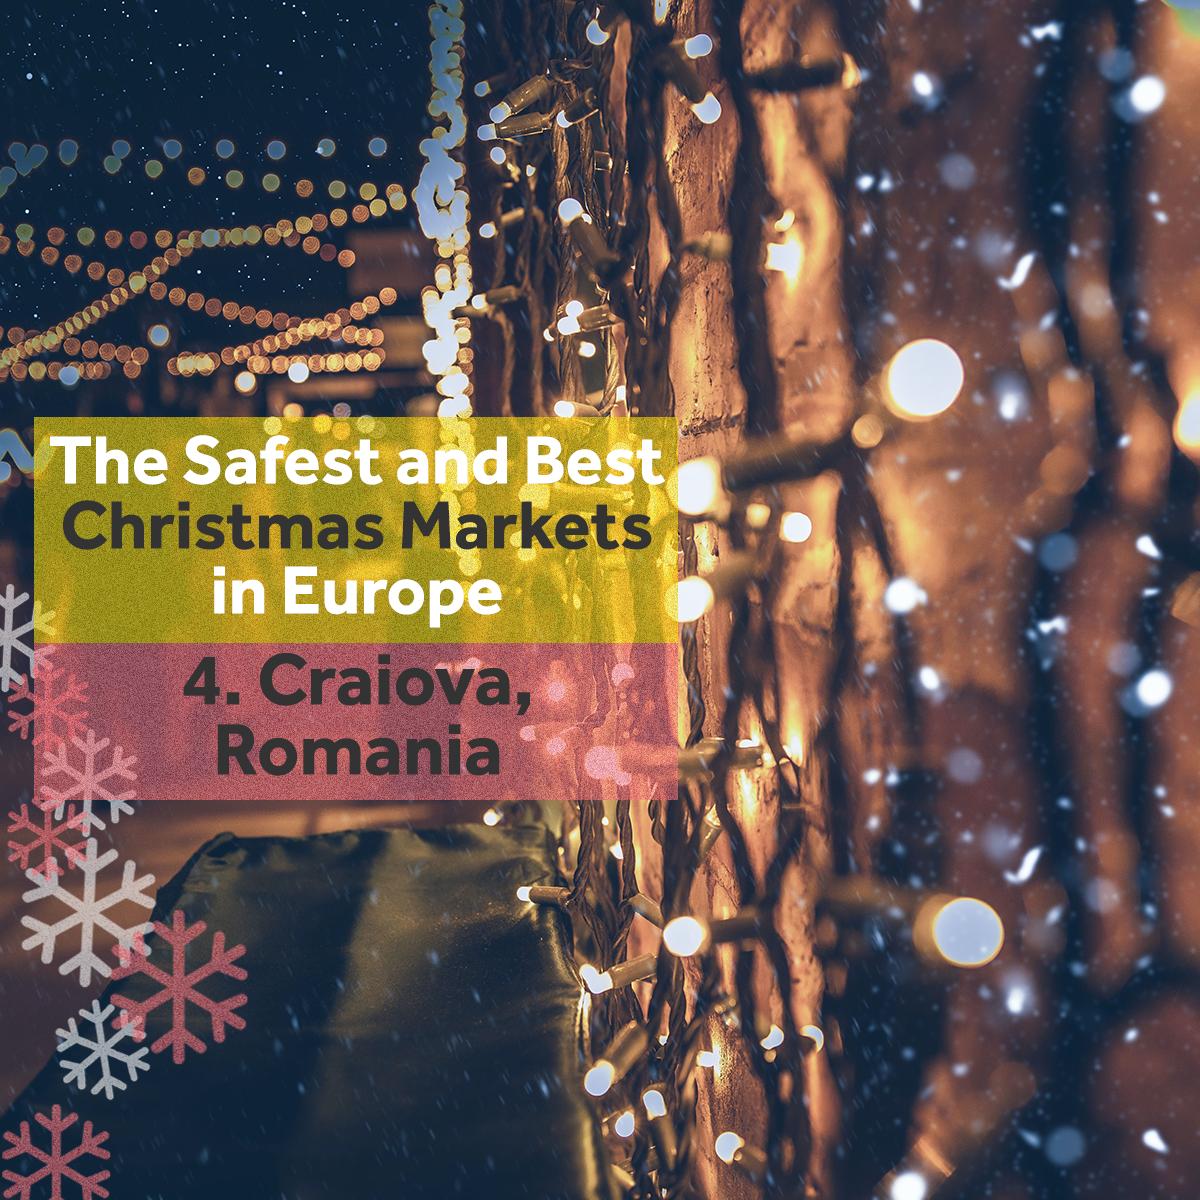 Christmas Markets Europe - Craiova